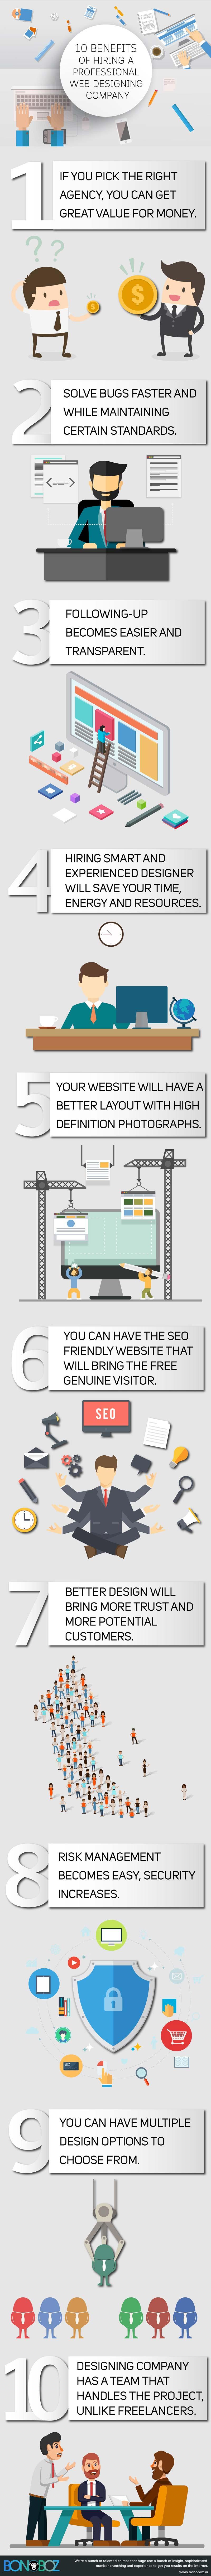 benefits of hiring a professional web design company